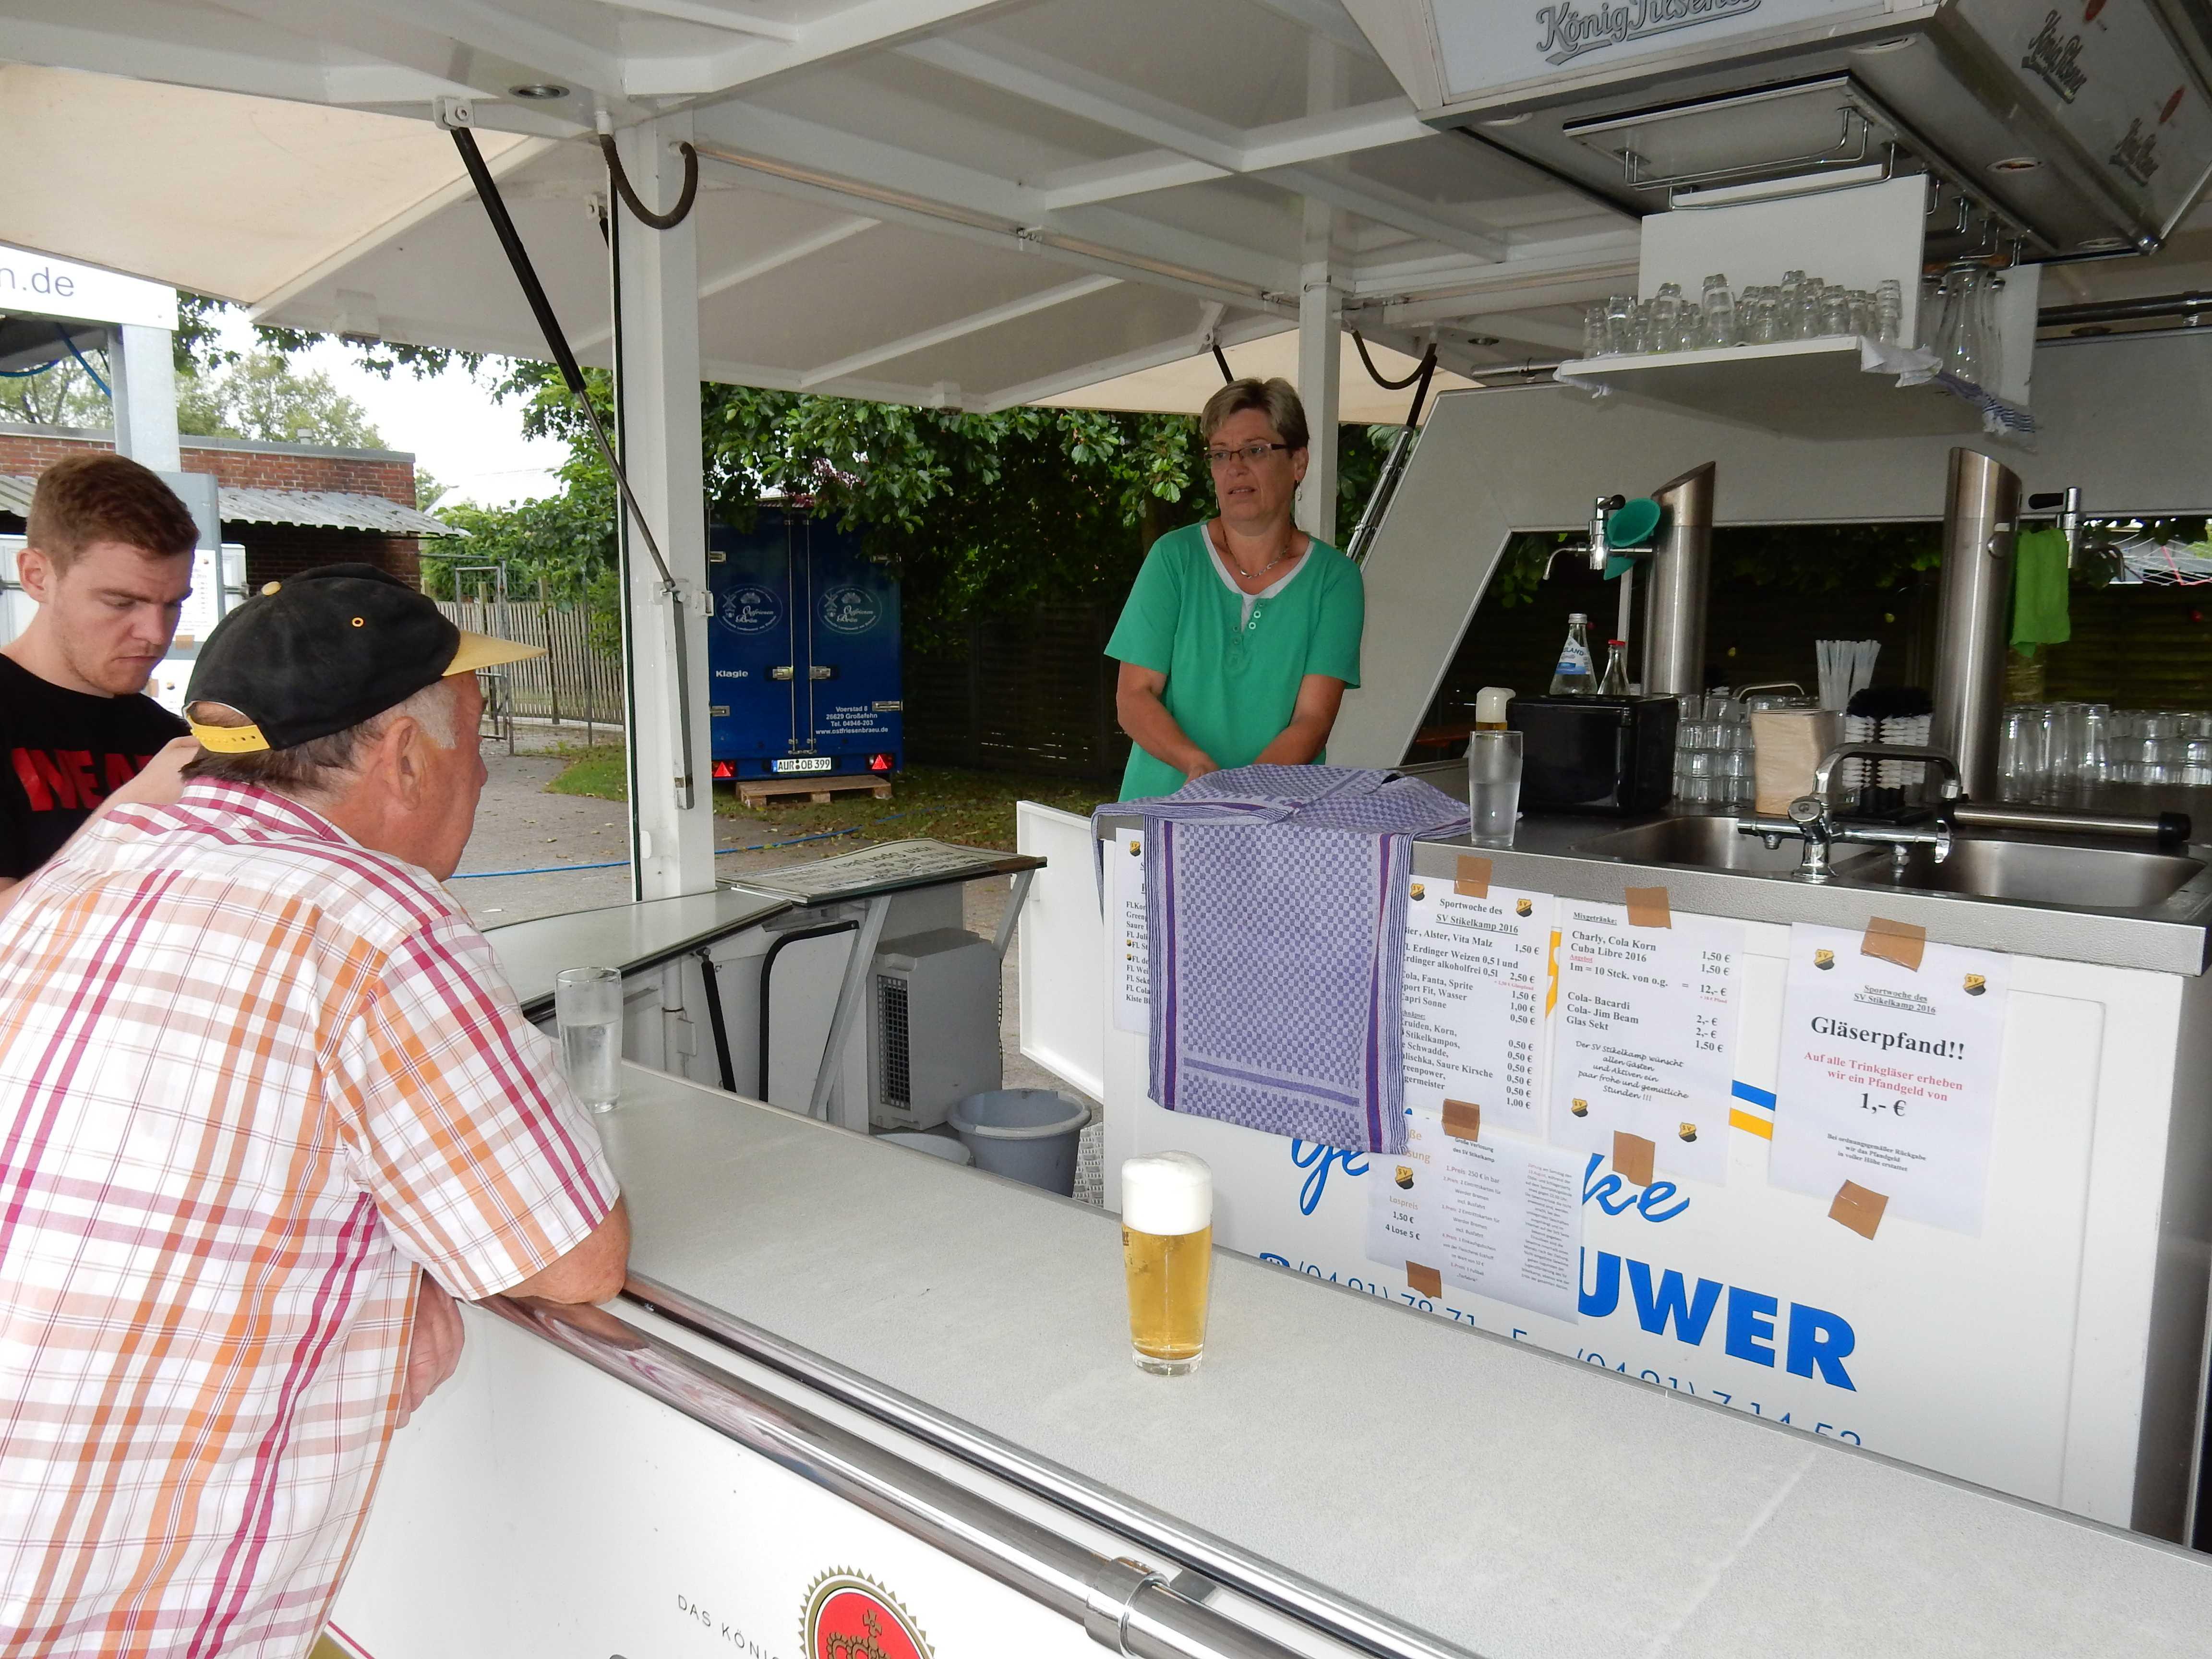 2016-07-29 Sportwoche - erster Freitag (8)